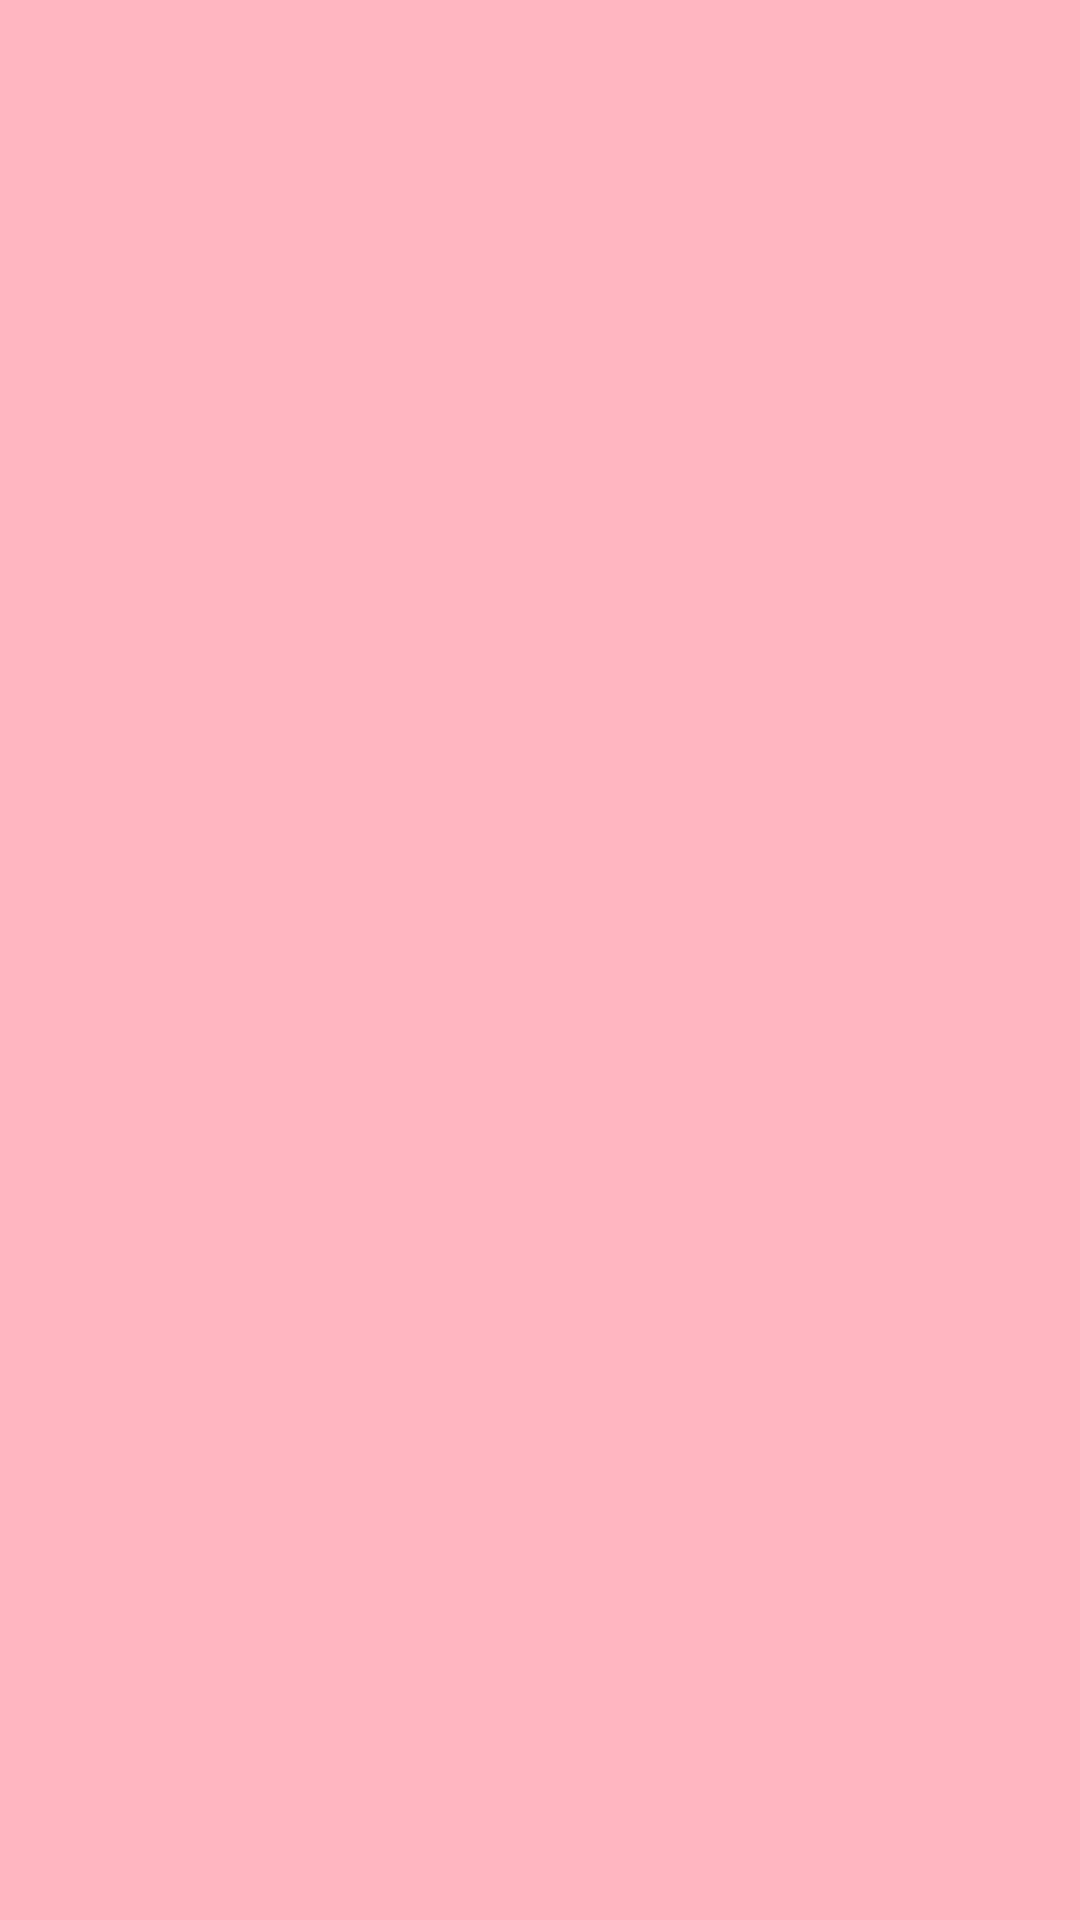 1080x1920 Light Pink Solid Color Background